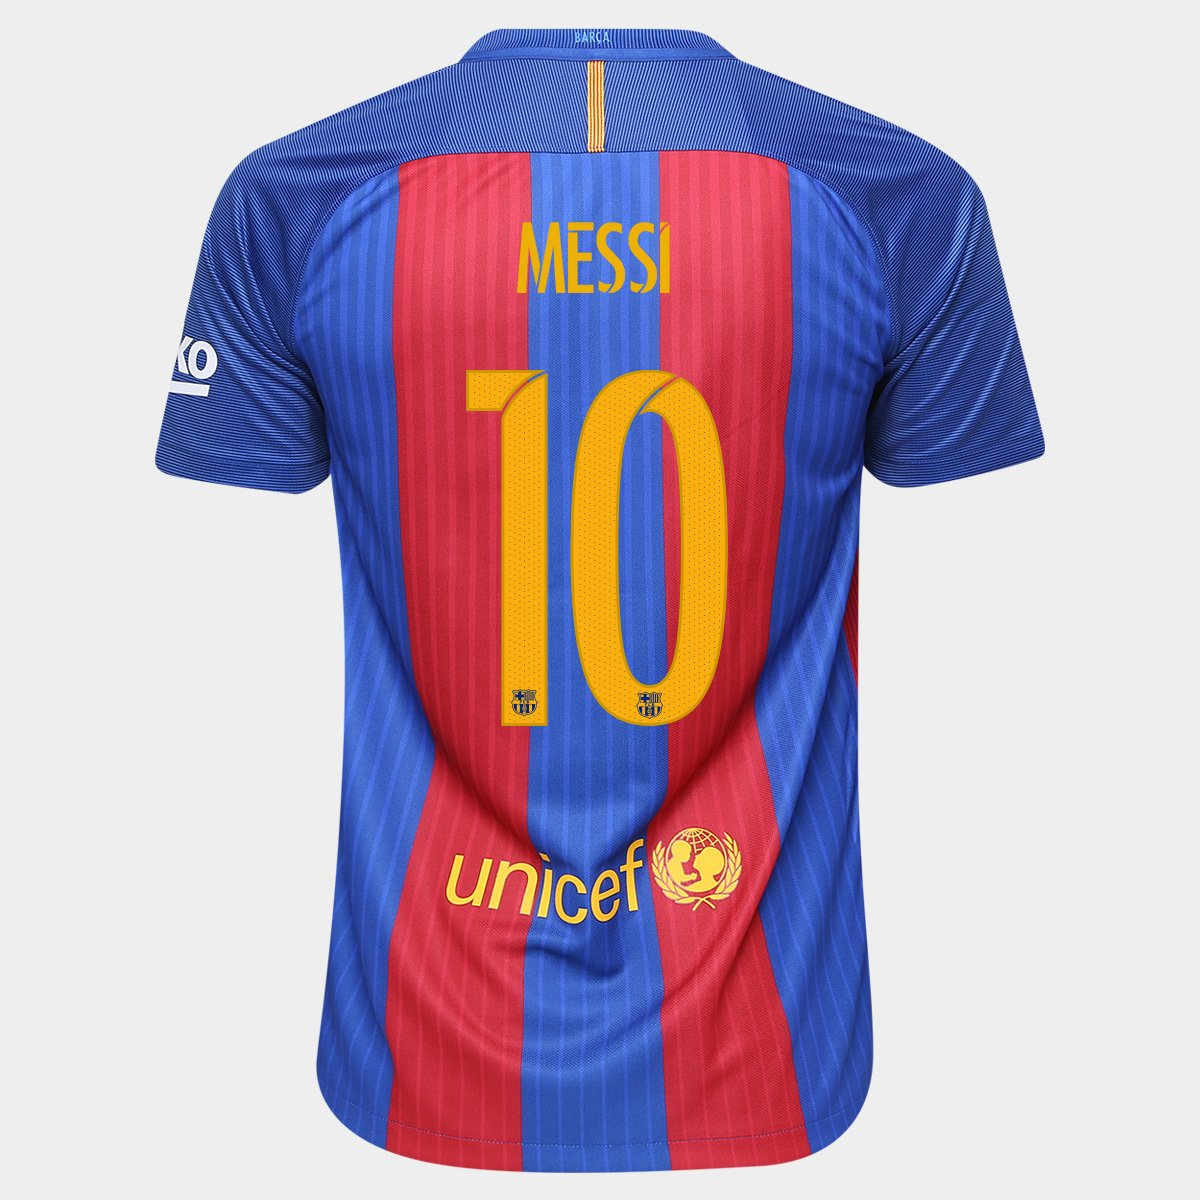 Camisa Nike Barcelona Home 16 17 Nº 10 - Messi - Compre Agora  8a61abf627f59